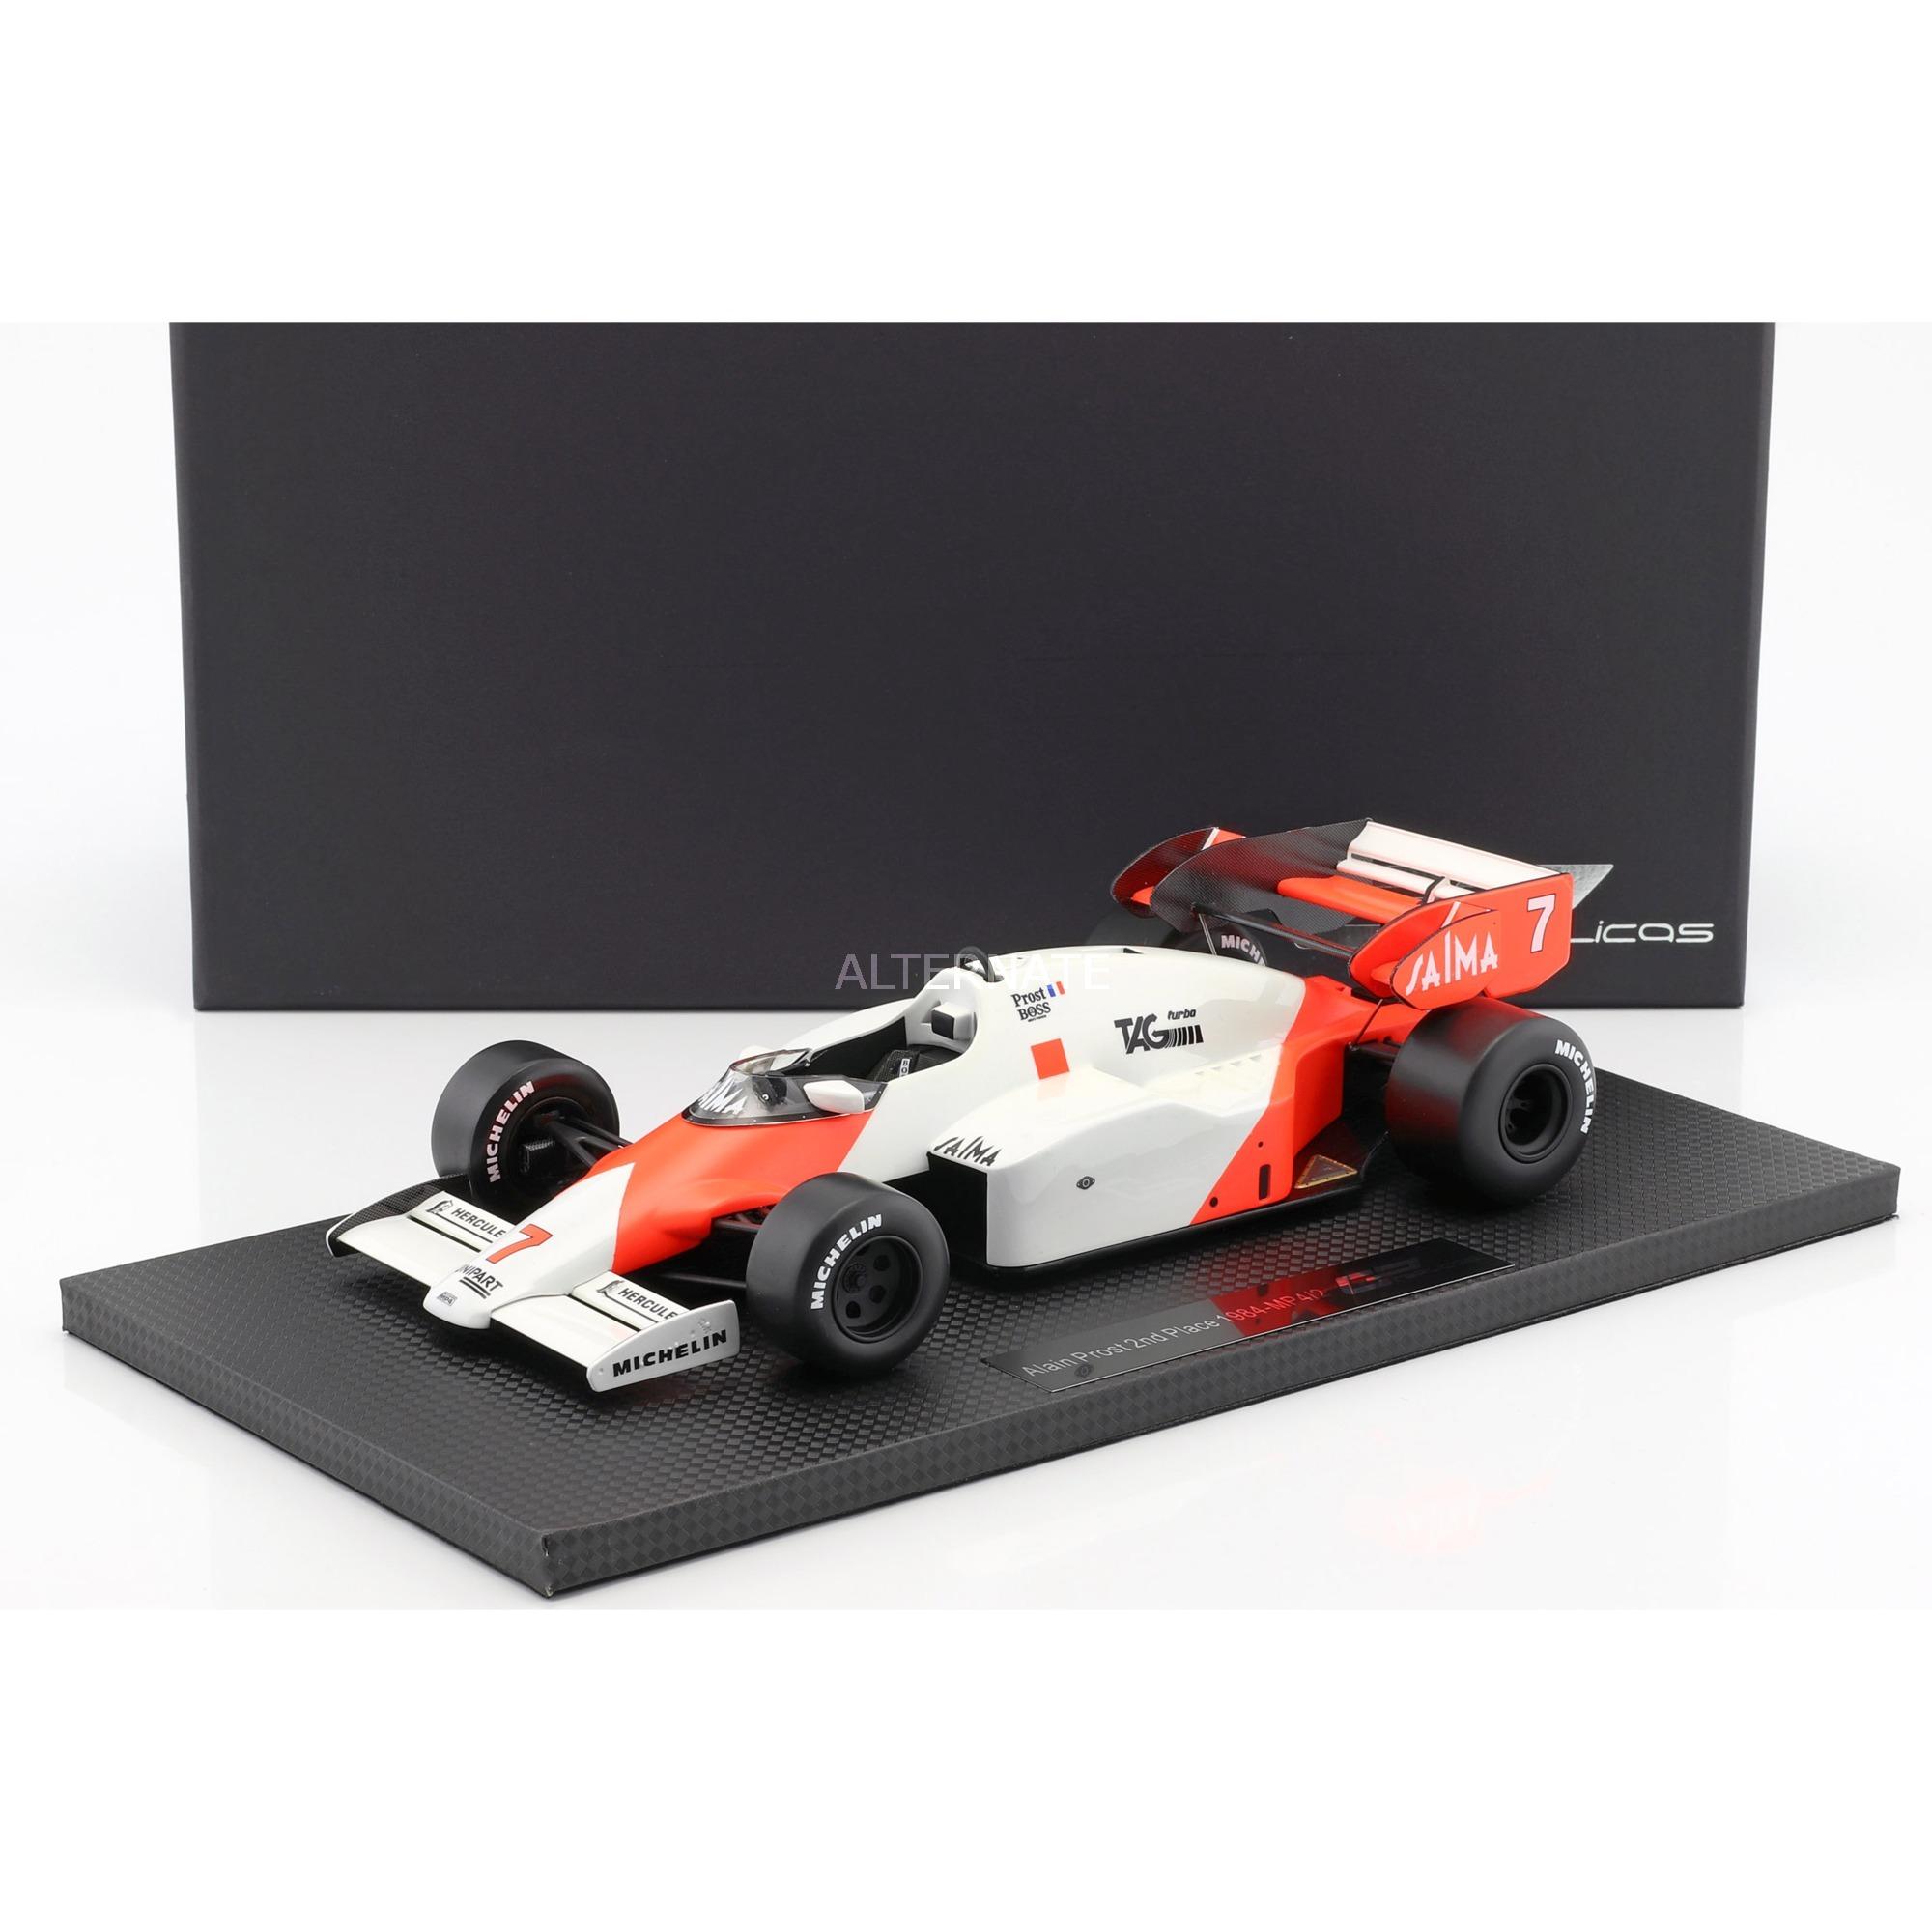 GP Replicas Alain Prost McLaren MP4/2 #7 2nd Formel 1 1984 1:18, Modellfahrzeug